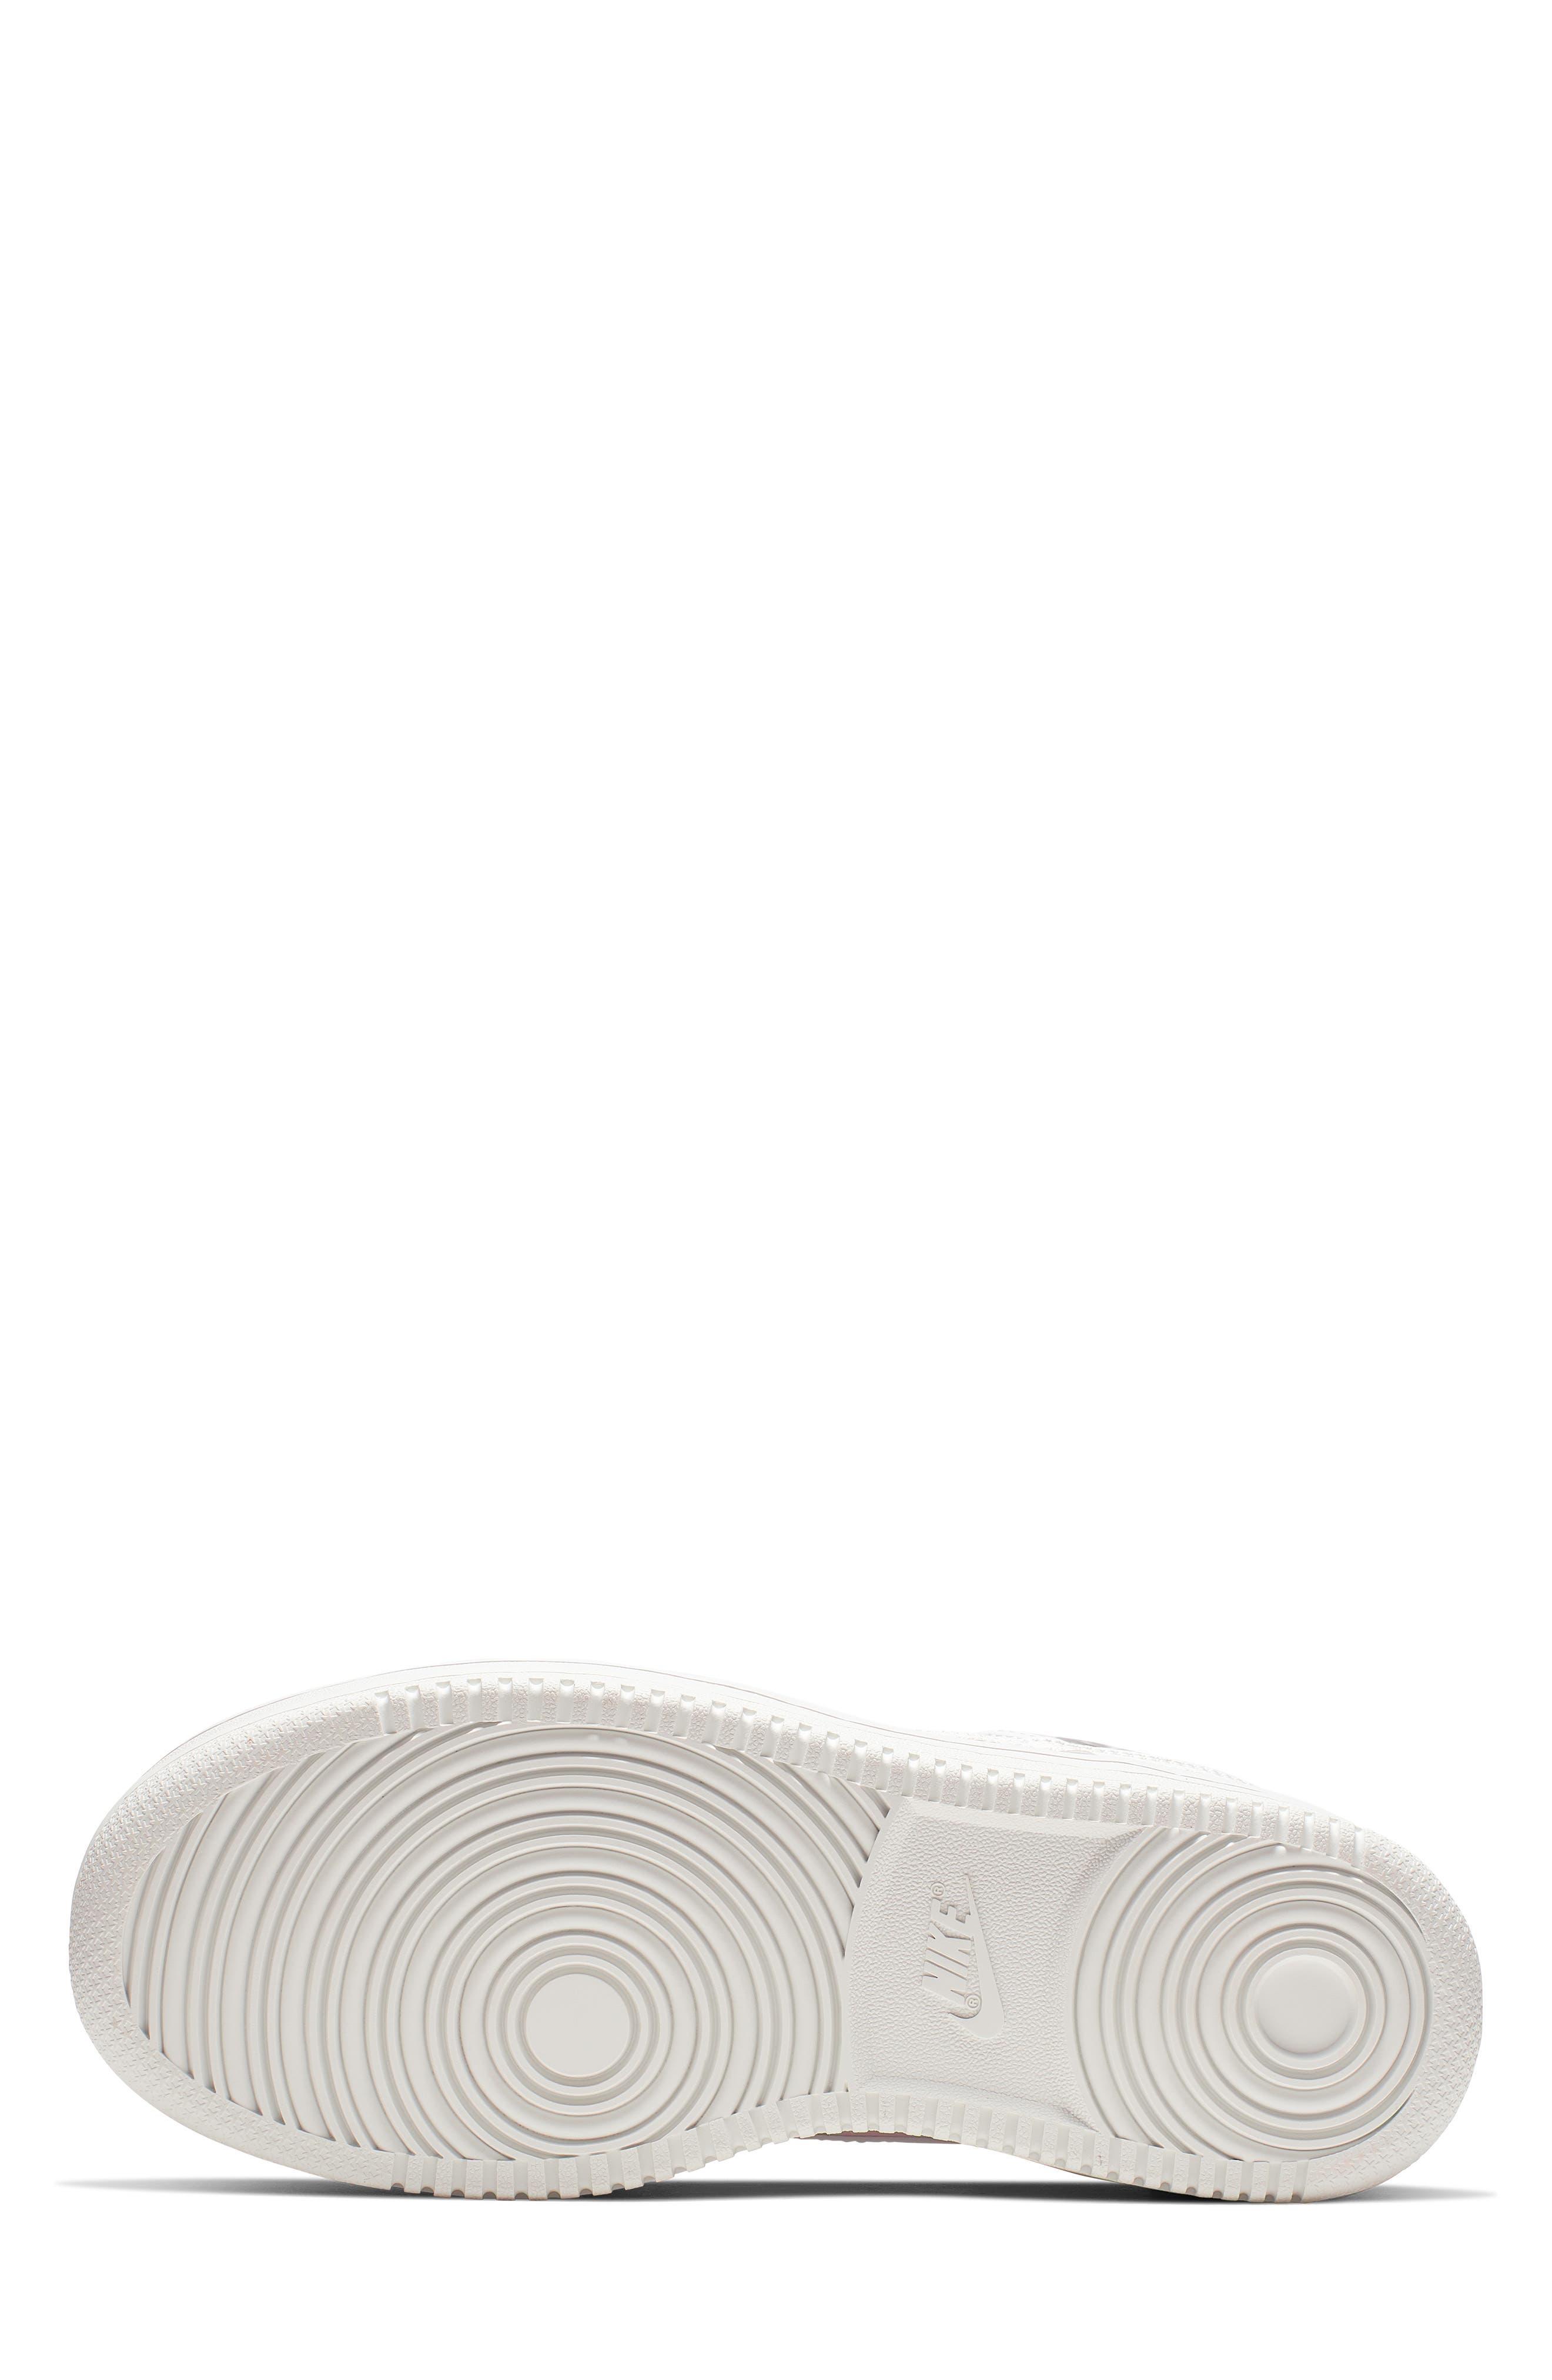 NIKE,                             Vandal 2K LX Platform Sneaker,                             Alternate thumbnail 5, color,                             WHITE/ WHITE/ BLACK